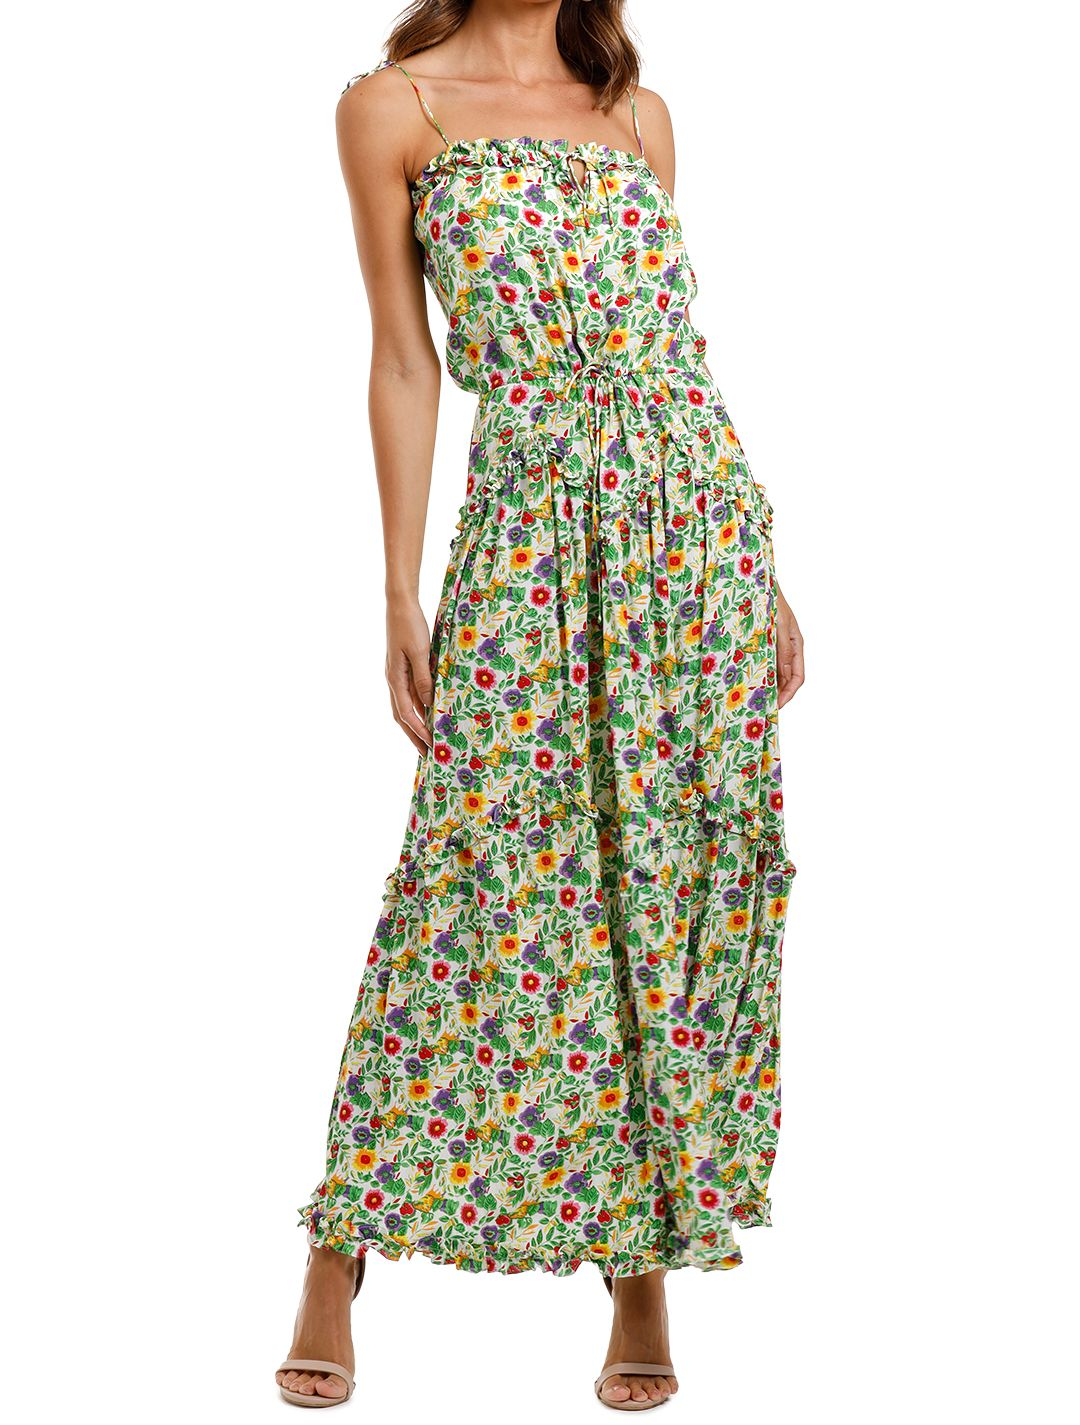 SWF Dynamic Dress multi floral